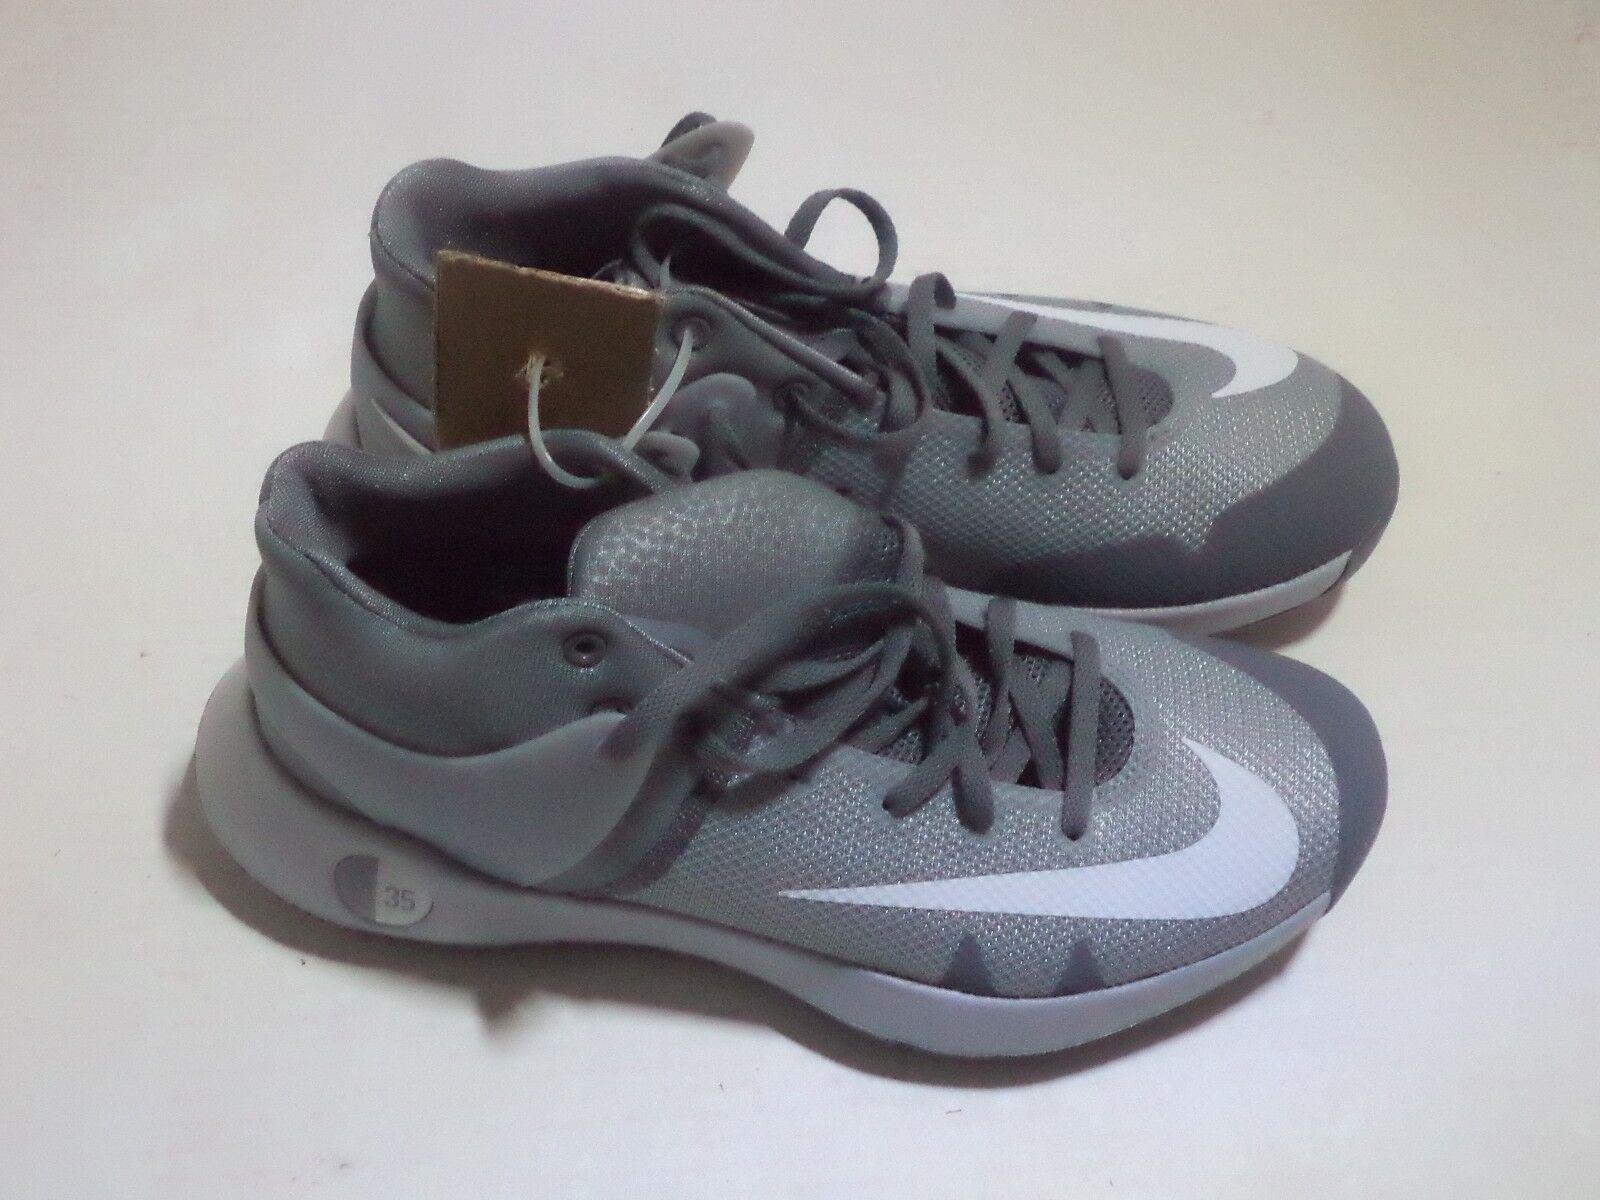 Nike uomini atletico kd trey 5 iv atletico uomini basket scarpe 8,5 i colori bianco e grigio 663c07